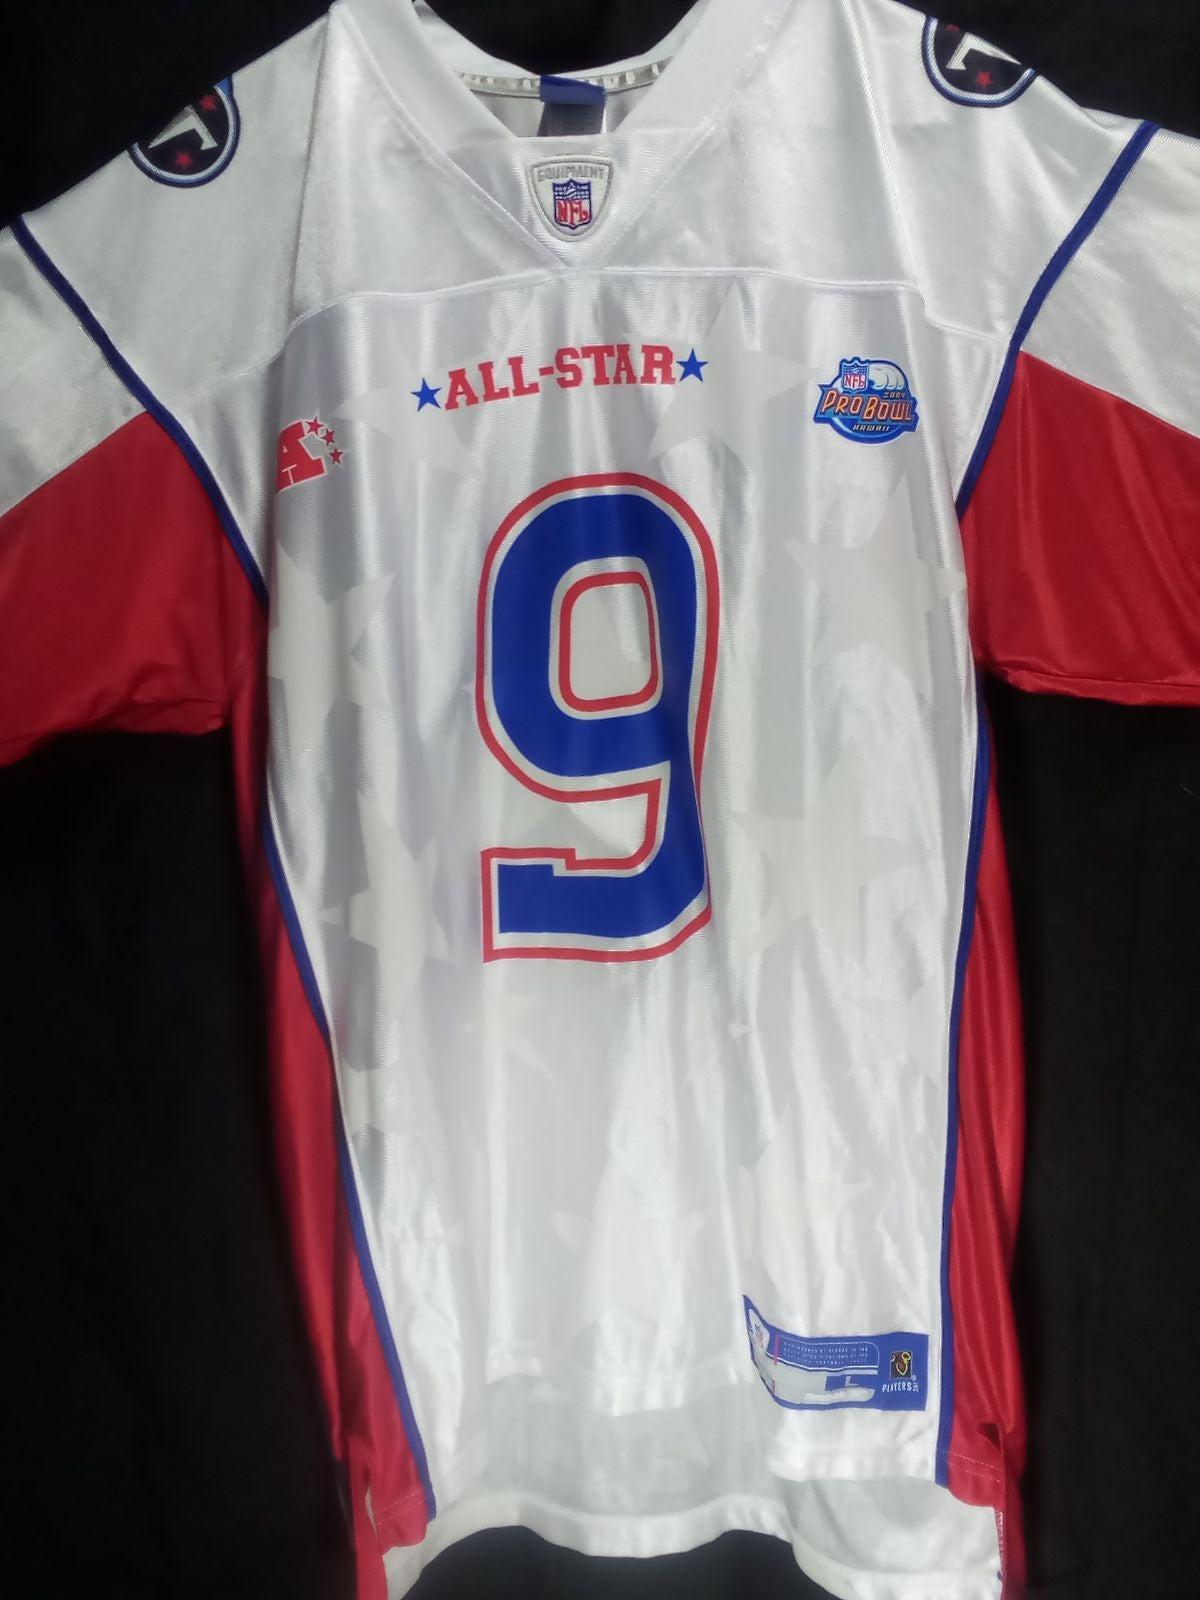 NFL Jersey Auth. Steve McNair - Pro Bowl